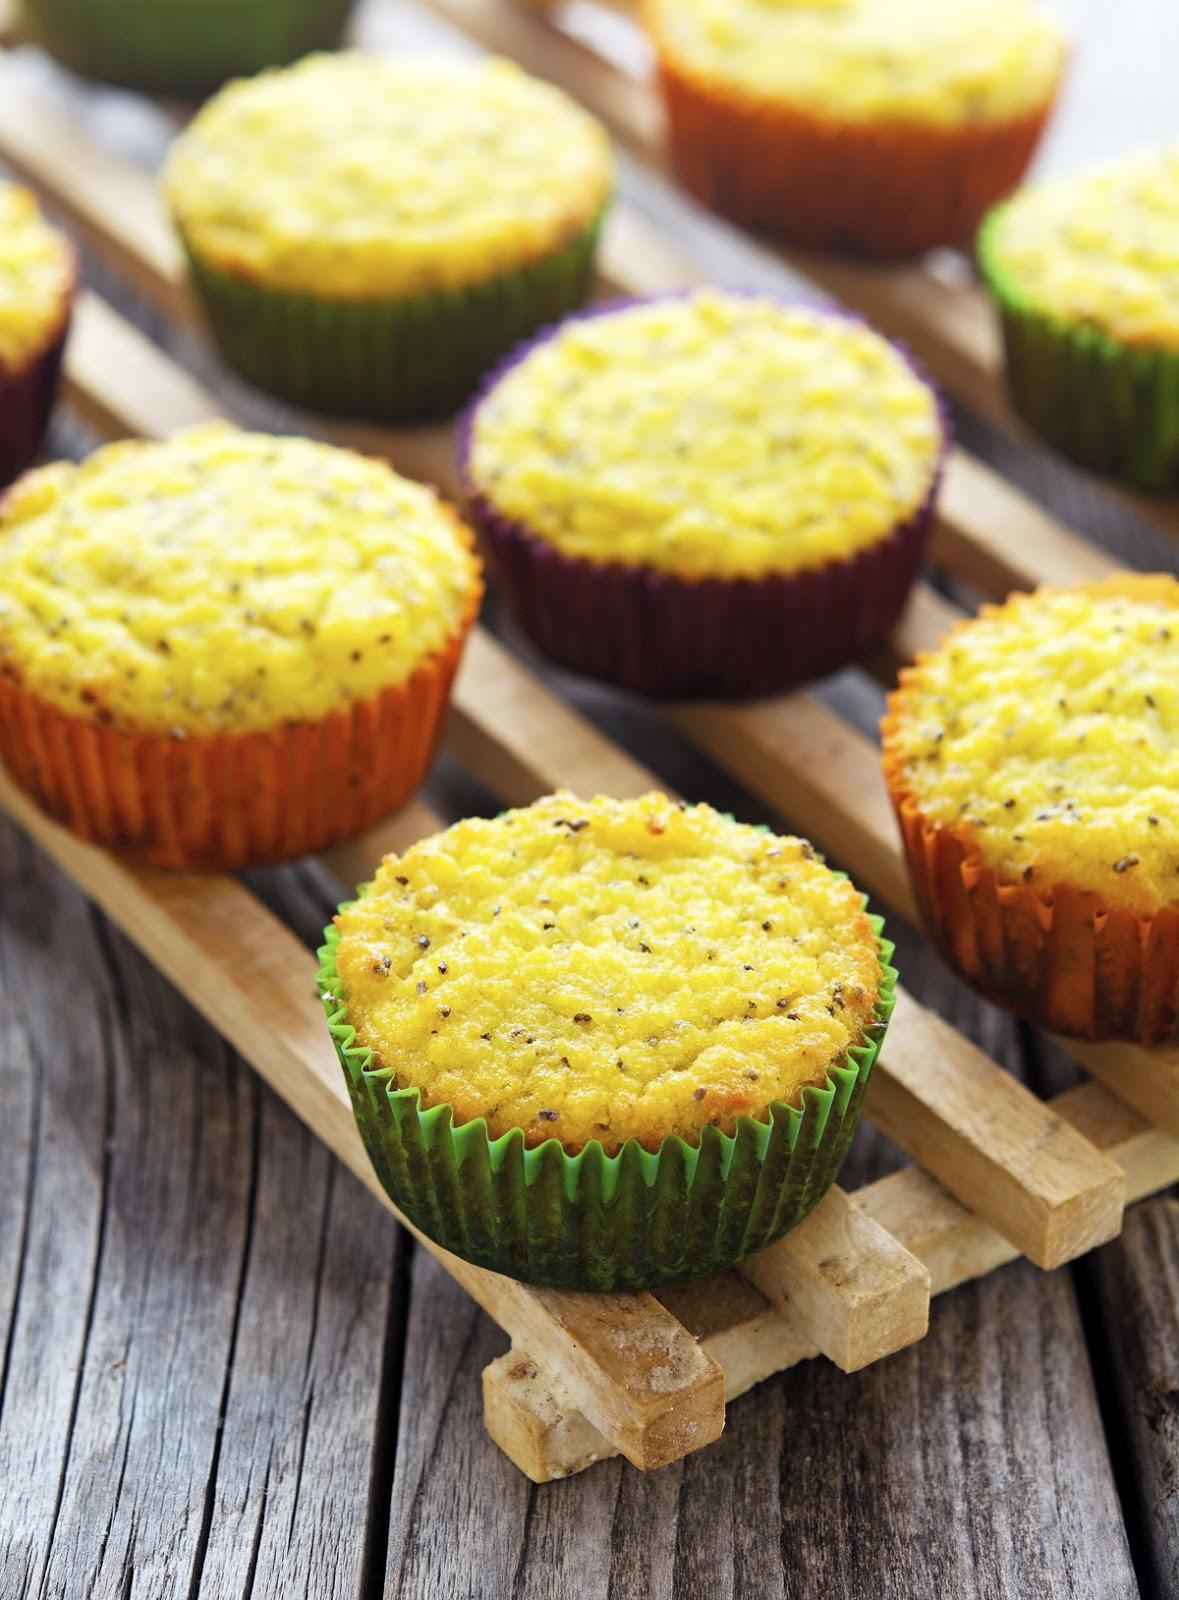 (Paleo) Coconut Lemon Chia Seed Muffins